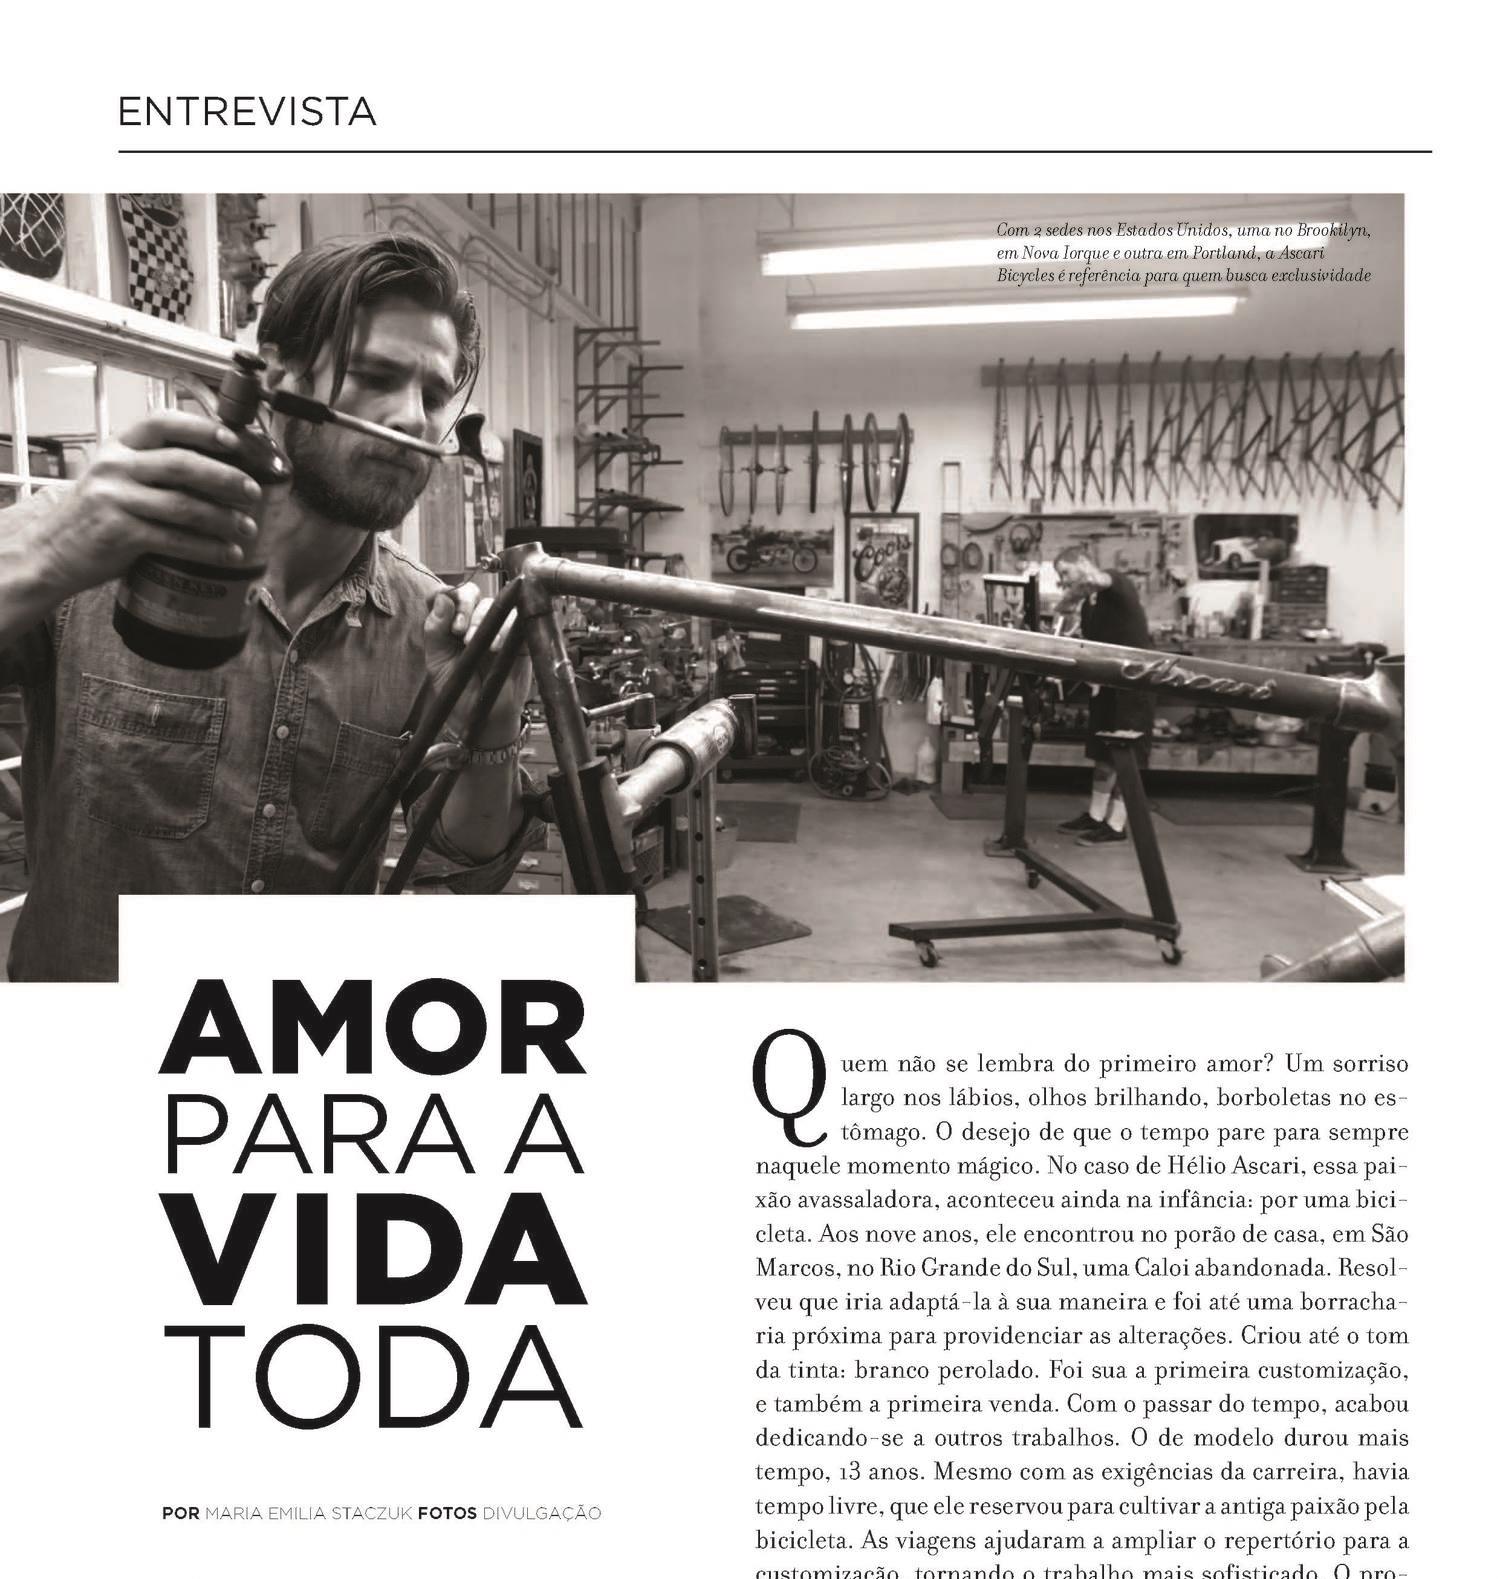 Imovel Magazine_Page_1.jpg